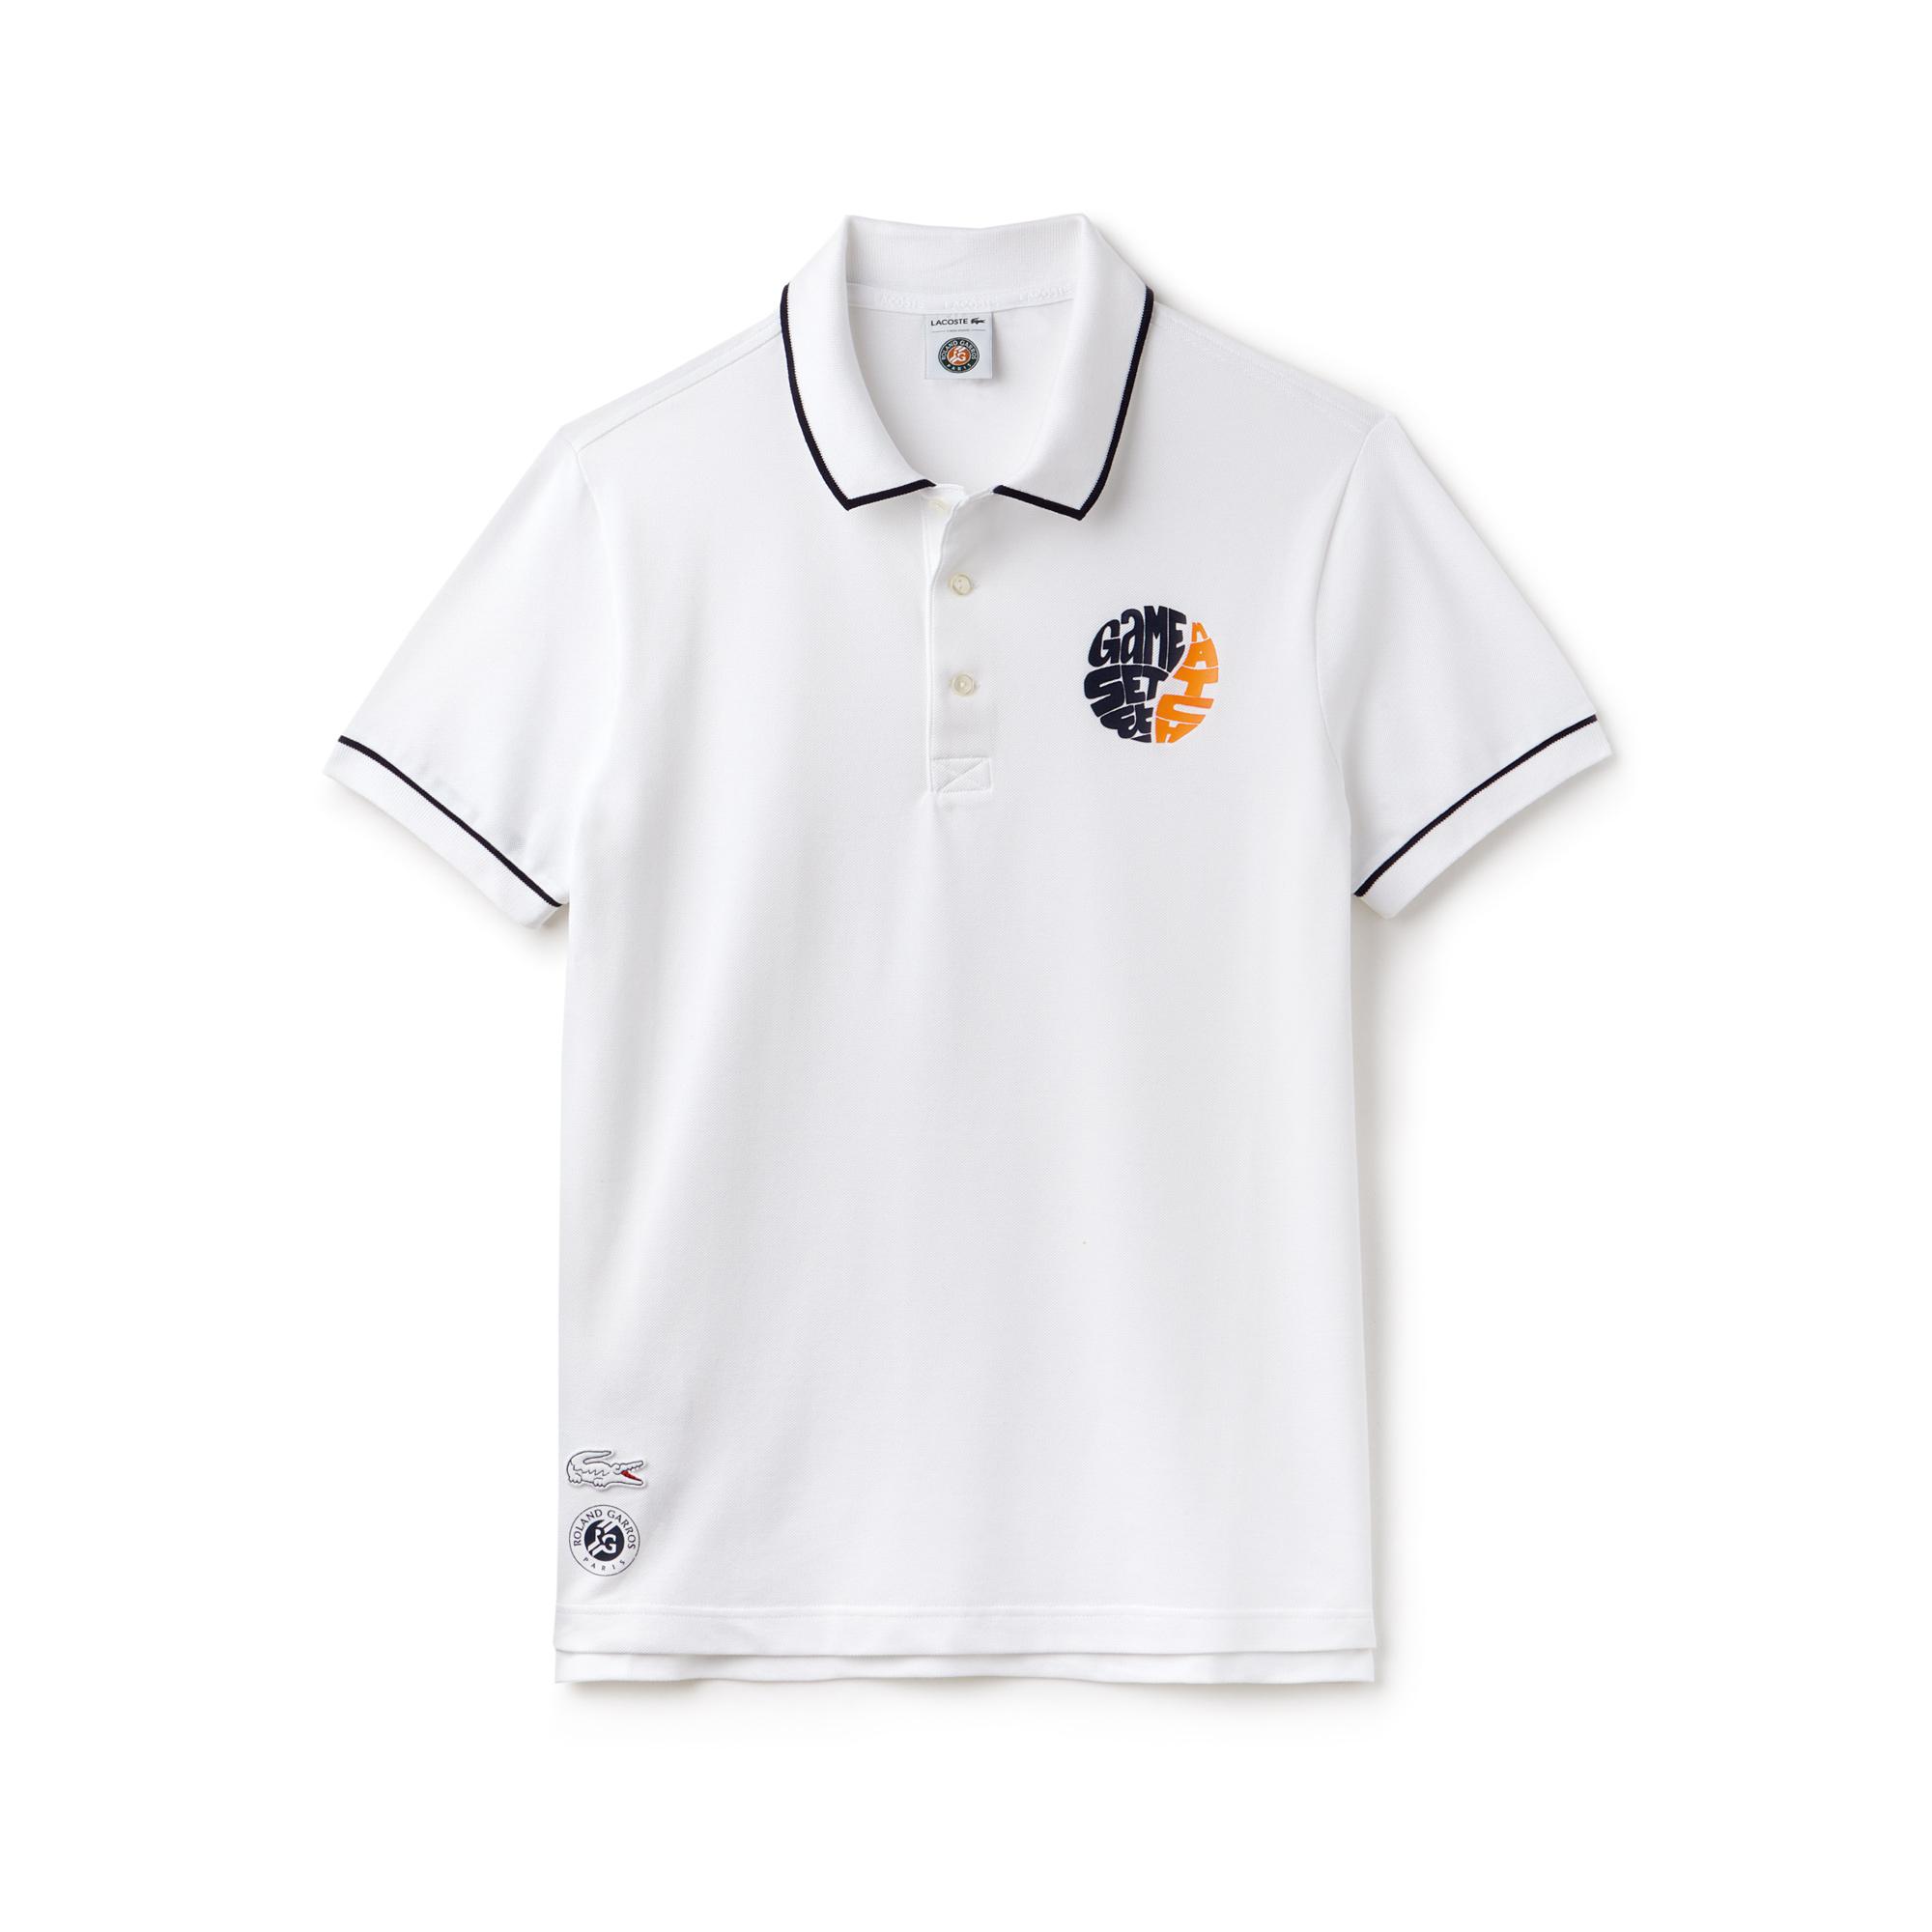 Polo game set match Lacoste x Roland-Garros / sportswear Roland-Garros